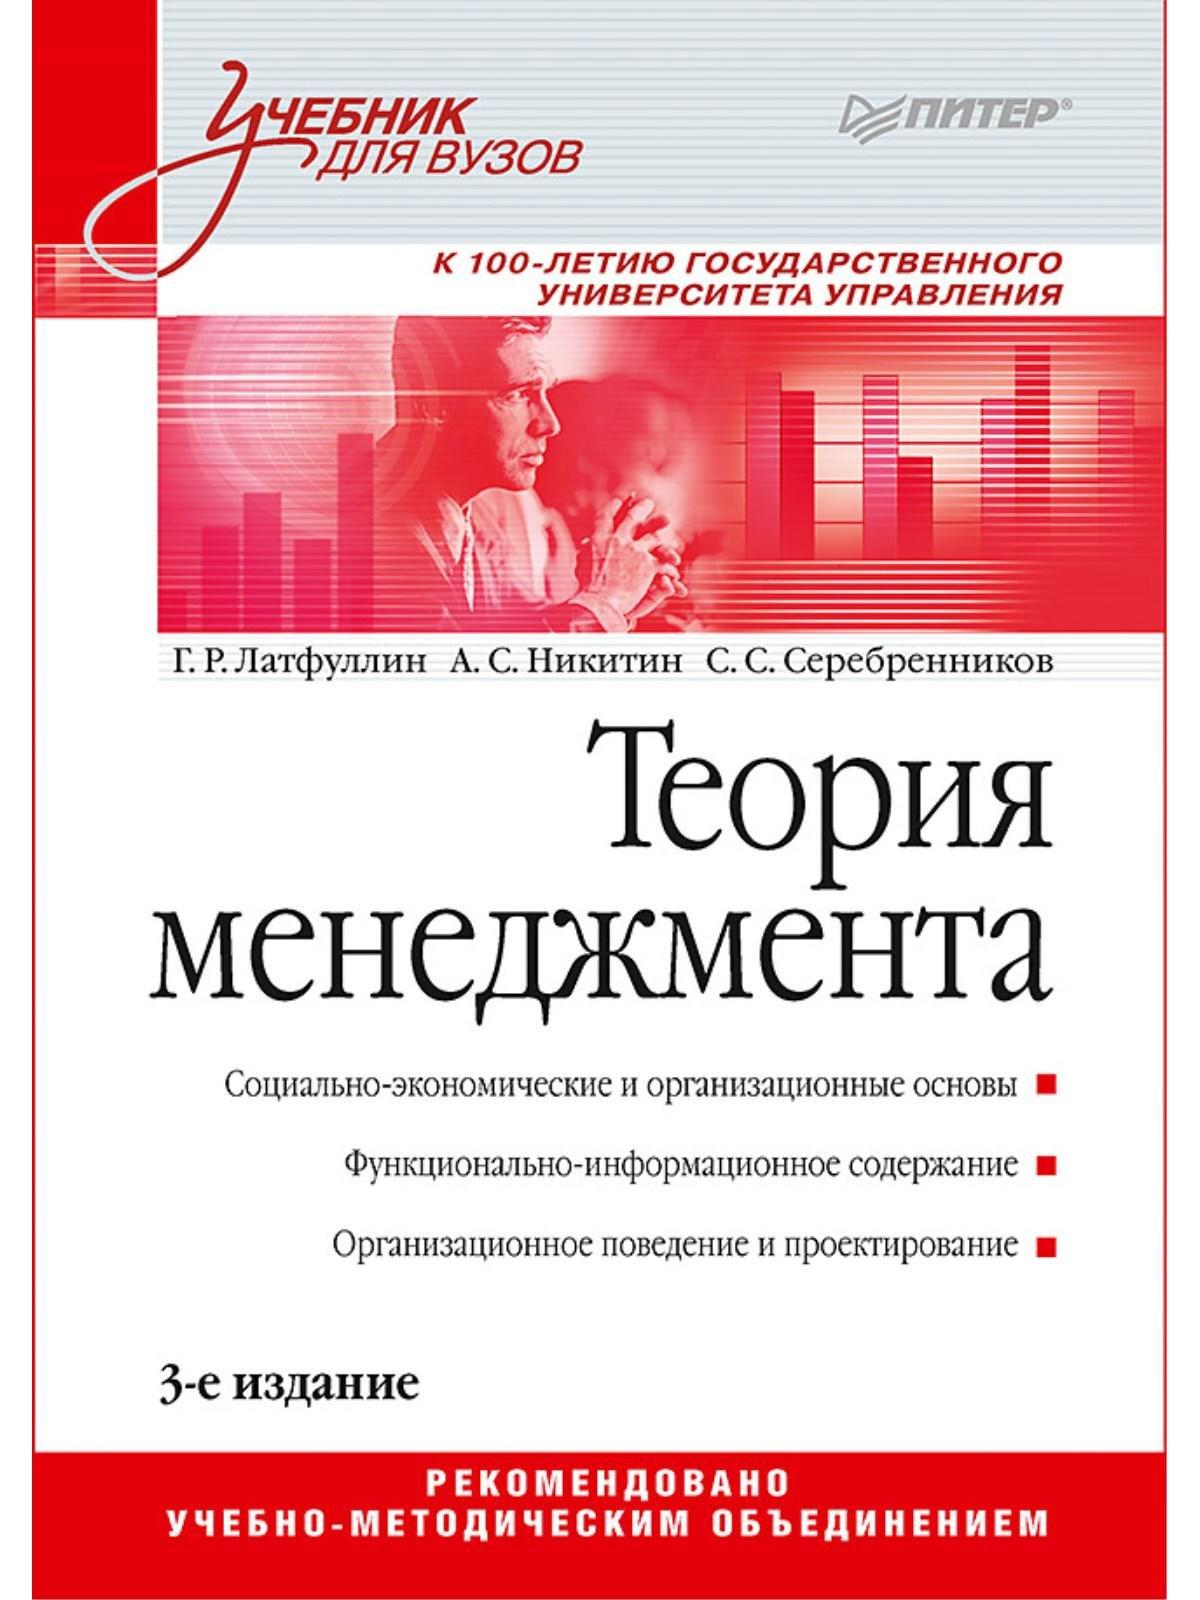 Латфуллин Г Р Теория менеджмента: Учебник для вузов. 3-е издание баринов в теория менеджмента учебник